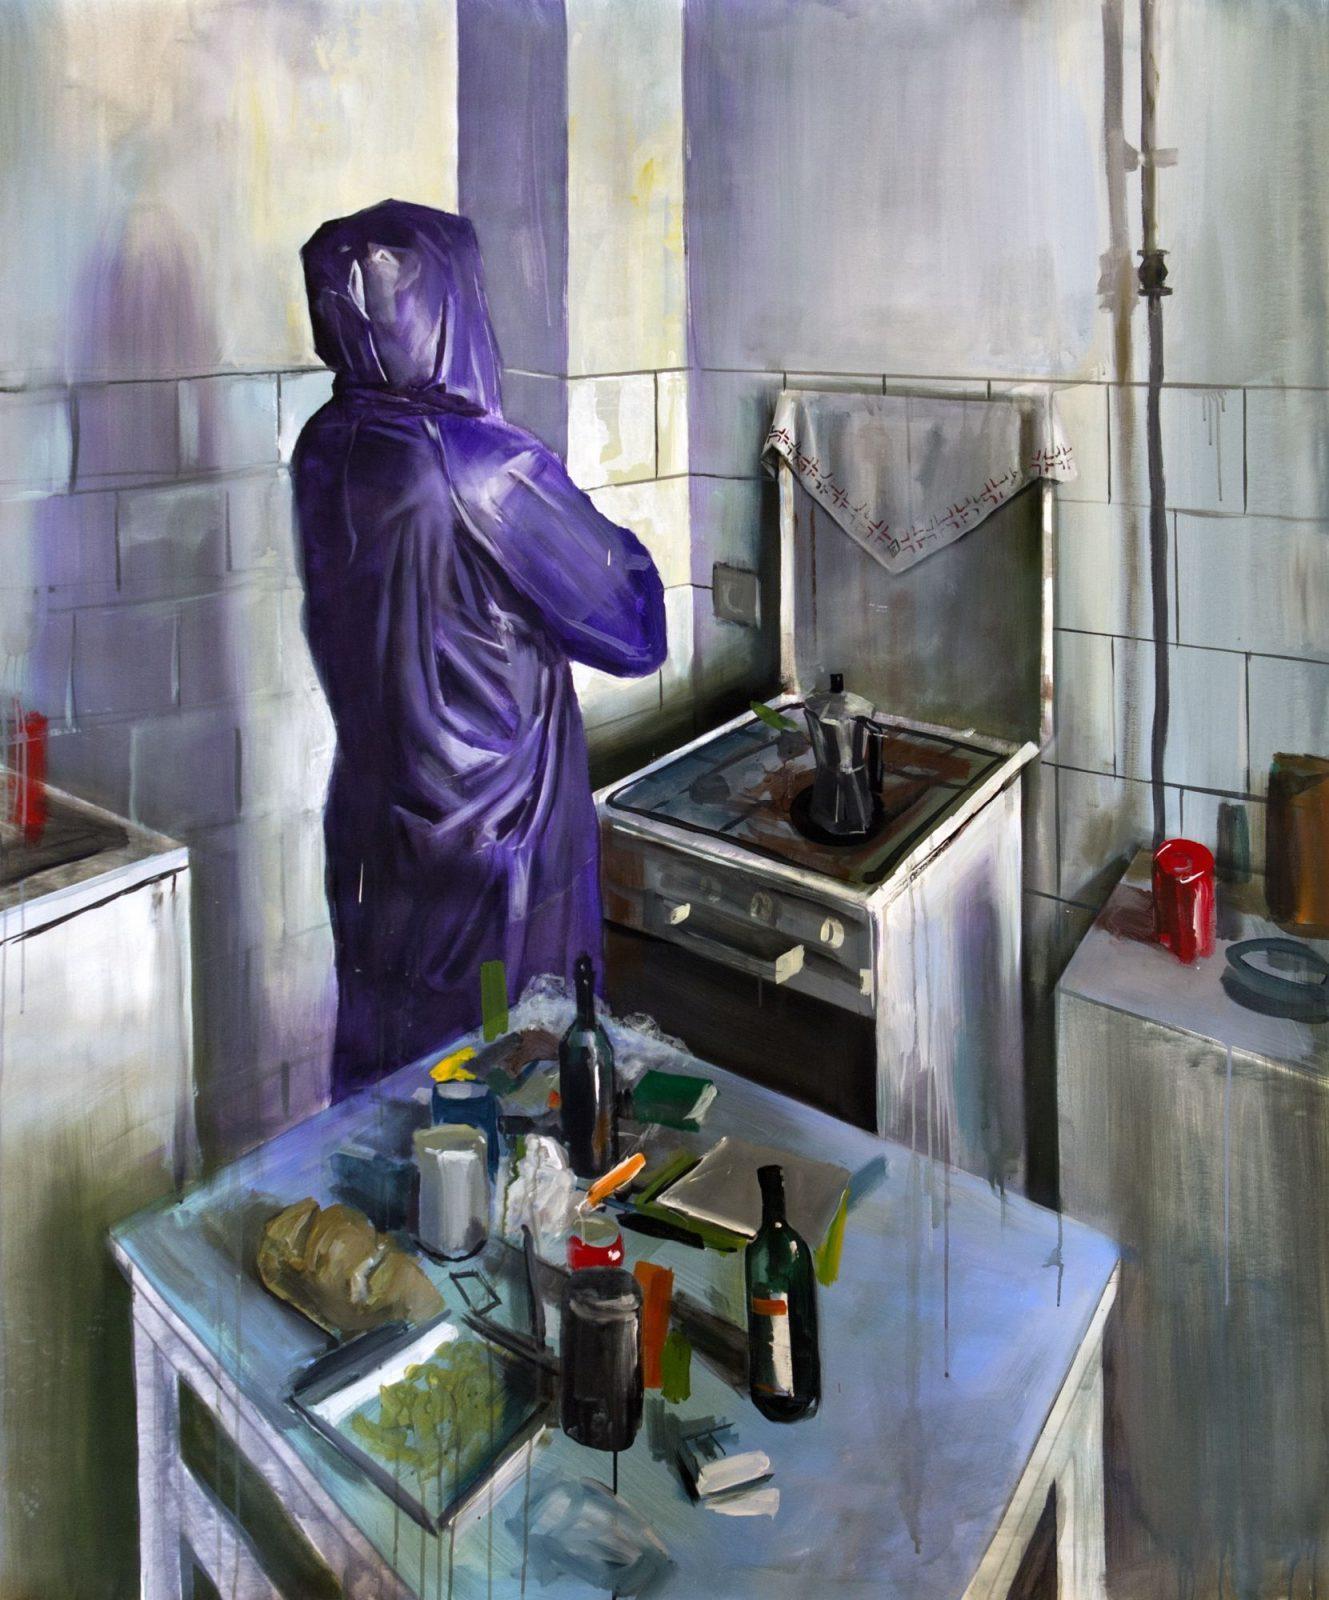 Herman Levente: Kiserlet – The Kitchen